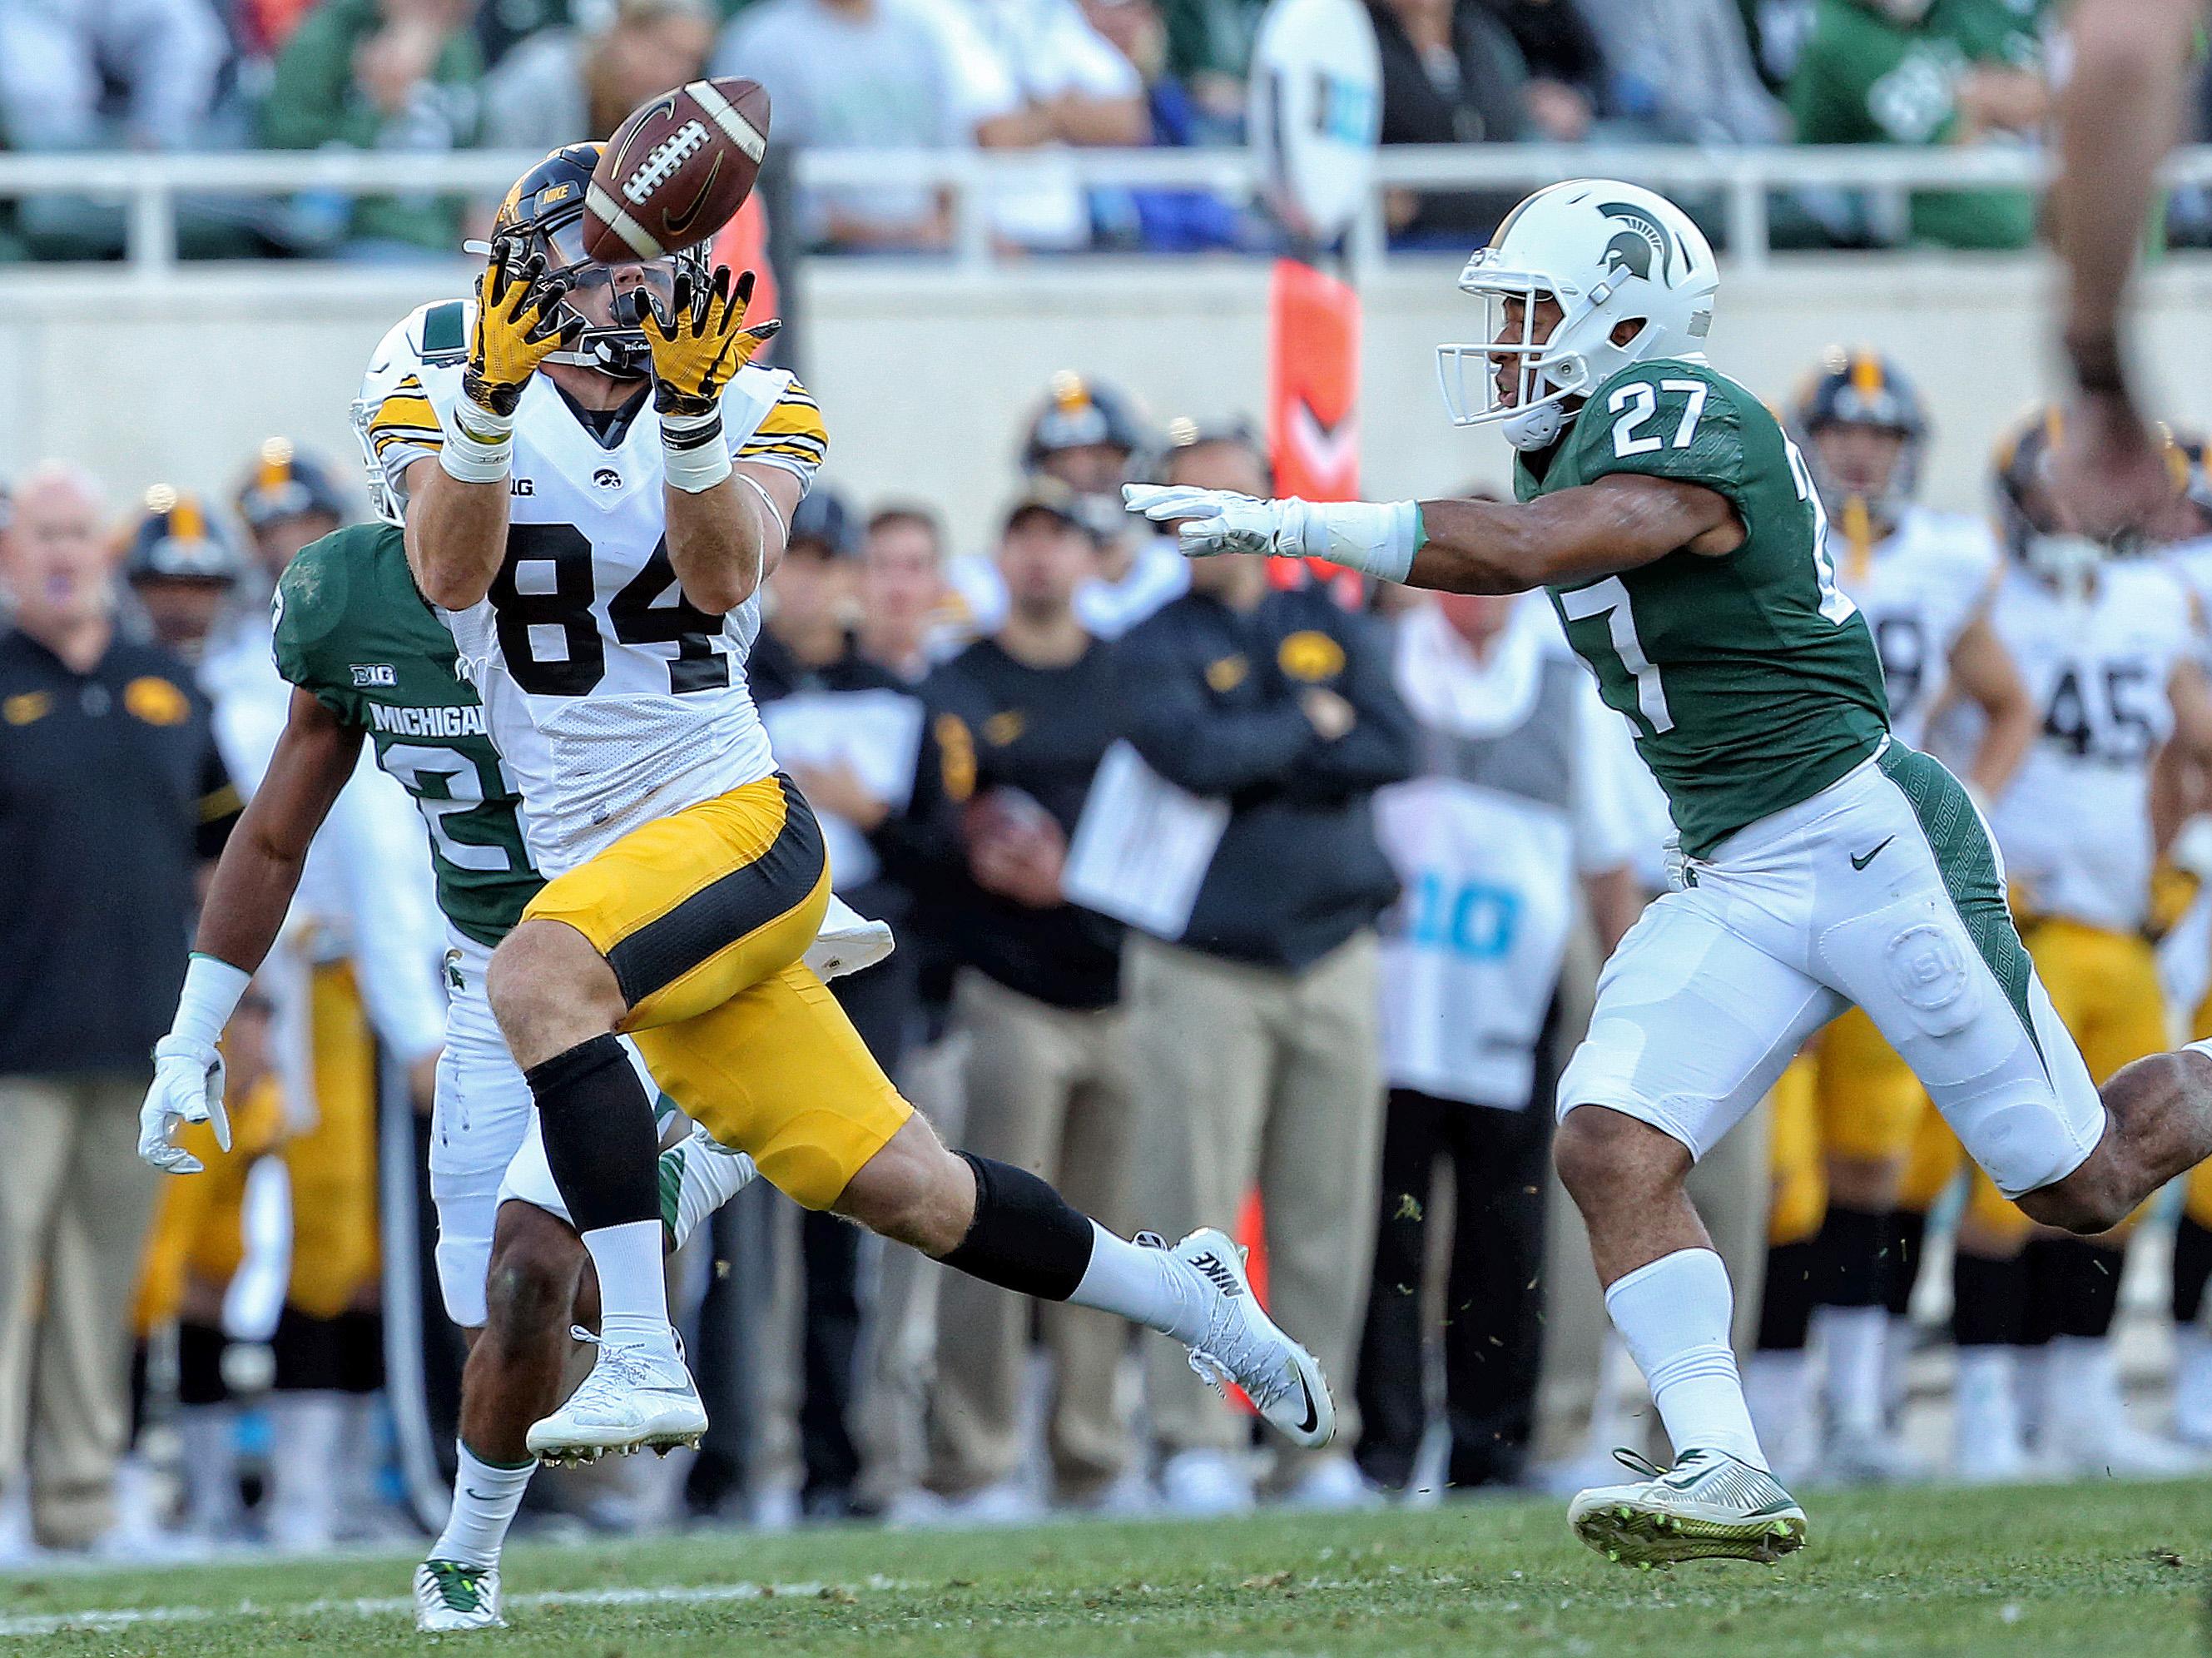 NCAA Football: Iowa at Michigan State